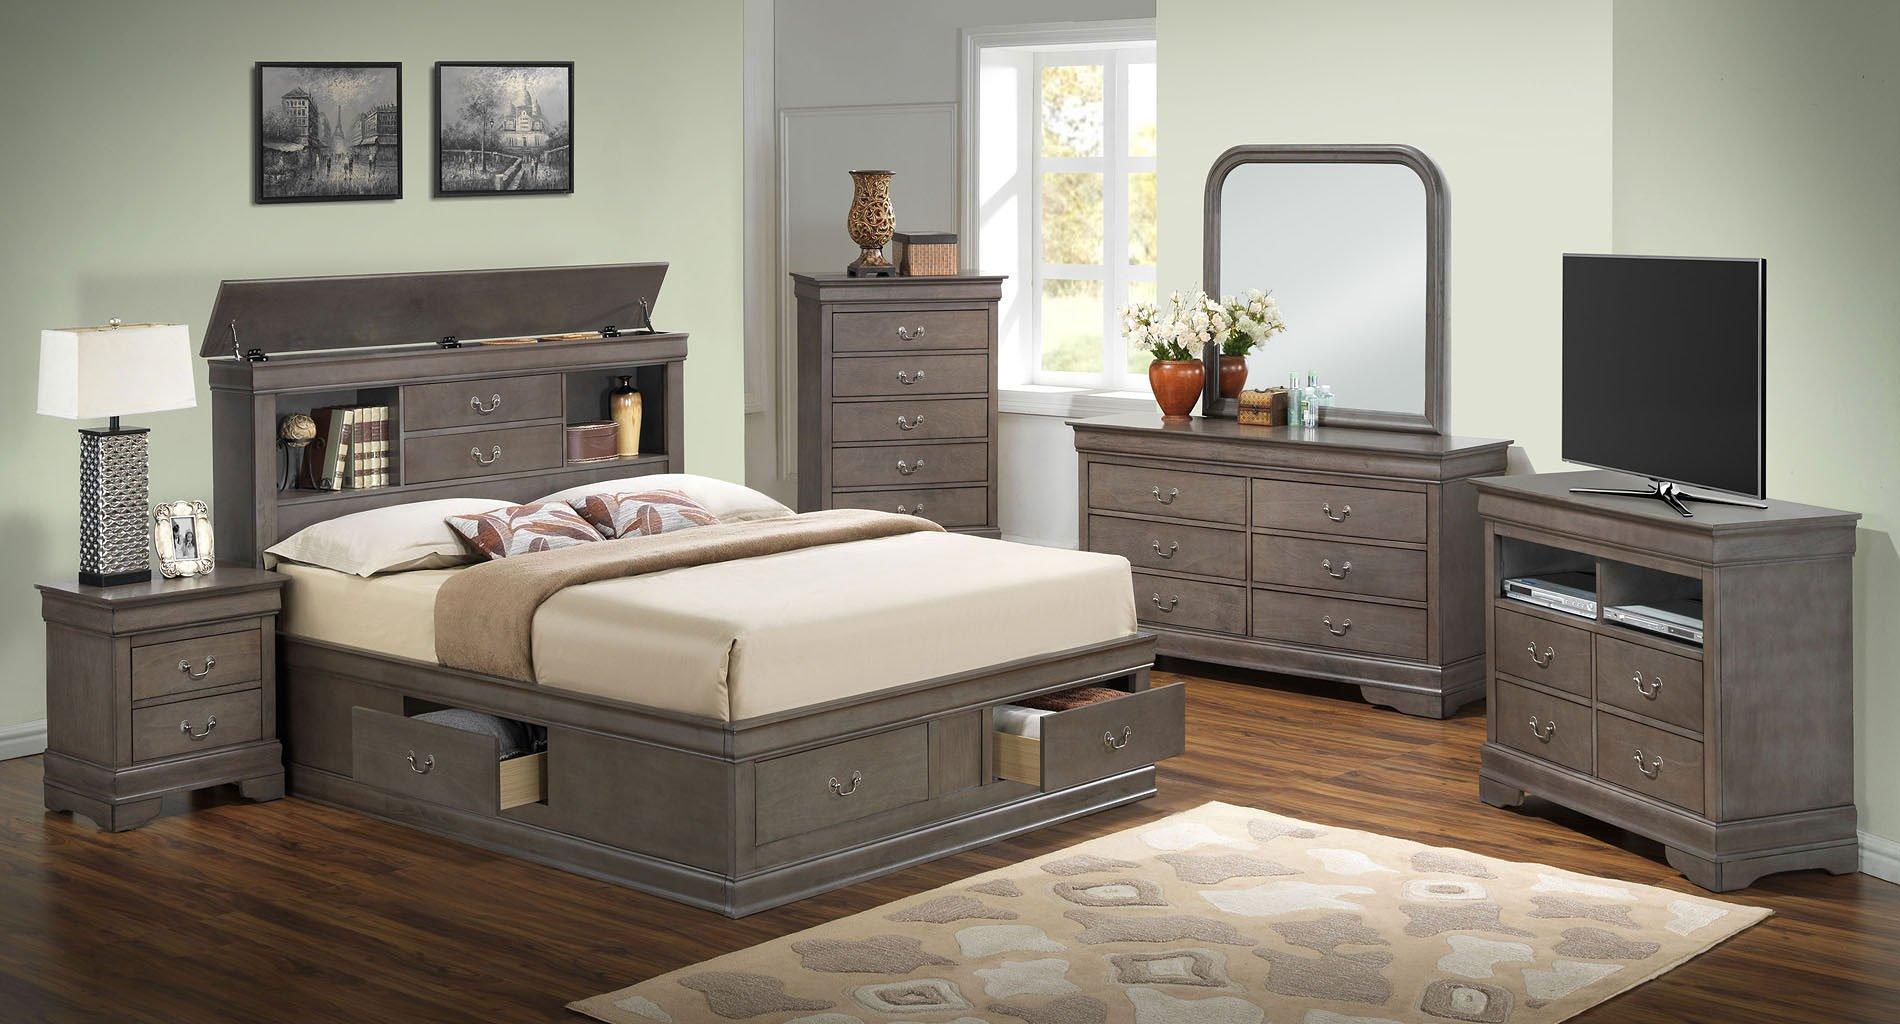 G3105 Bookcase Storage Bedroom Set Glory Furniture Furniture Cart